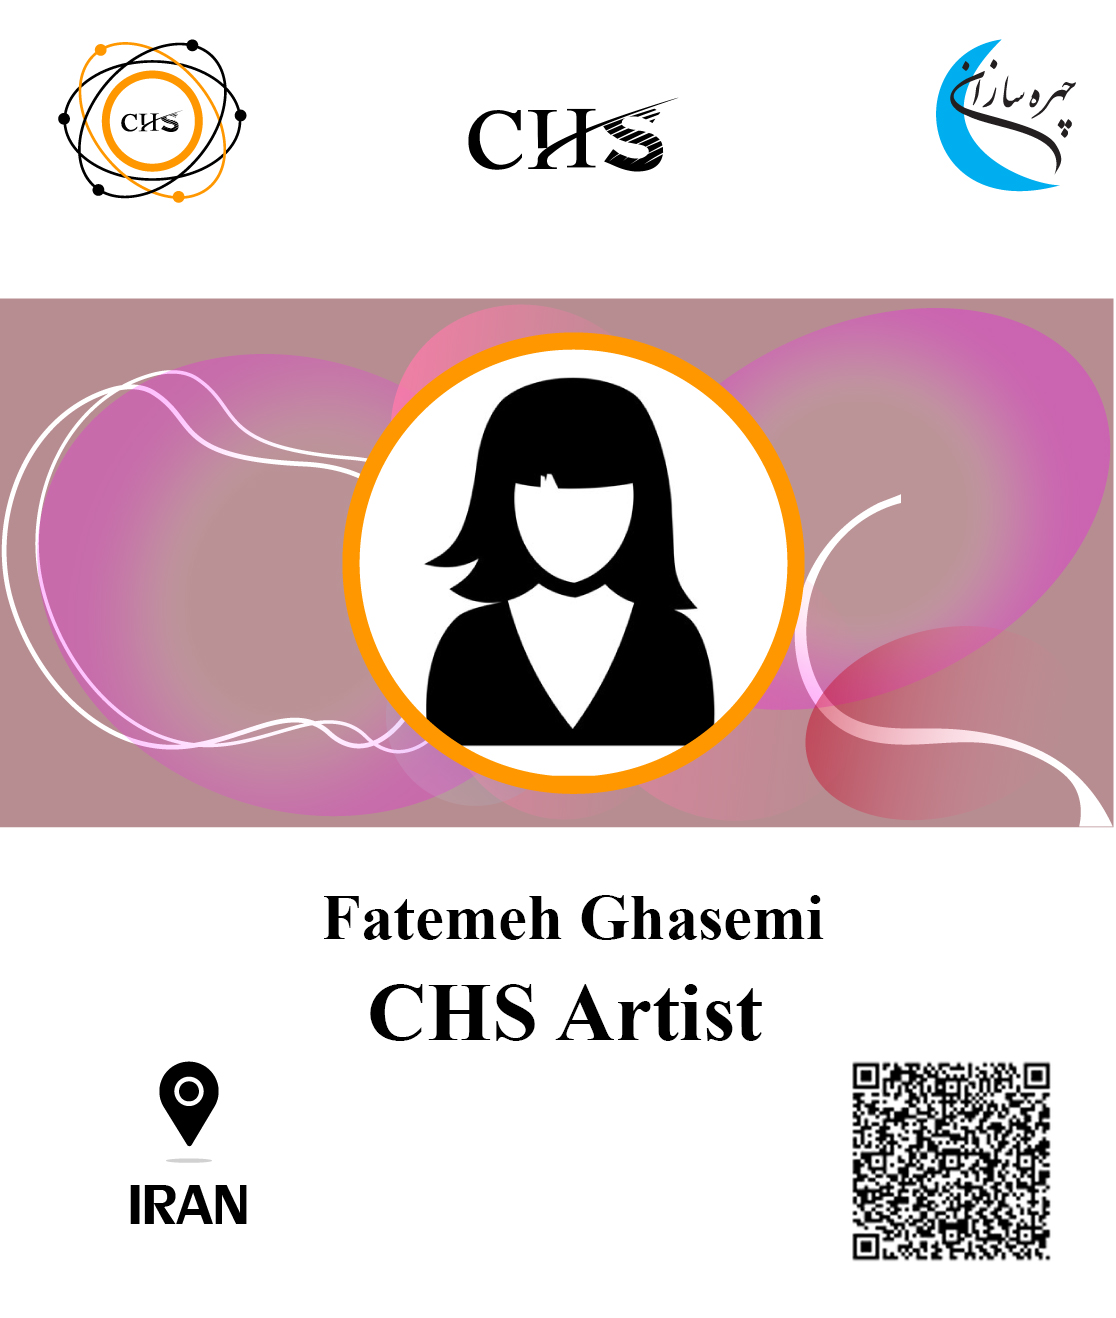 Fatemeh Ghasemi, phillings training certificate, phillings, phillings certificate, phillings training, phillings training Fatemeh Ghasemi, phillings certificate Fatemeh Ghasemi